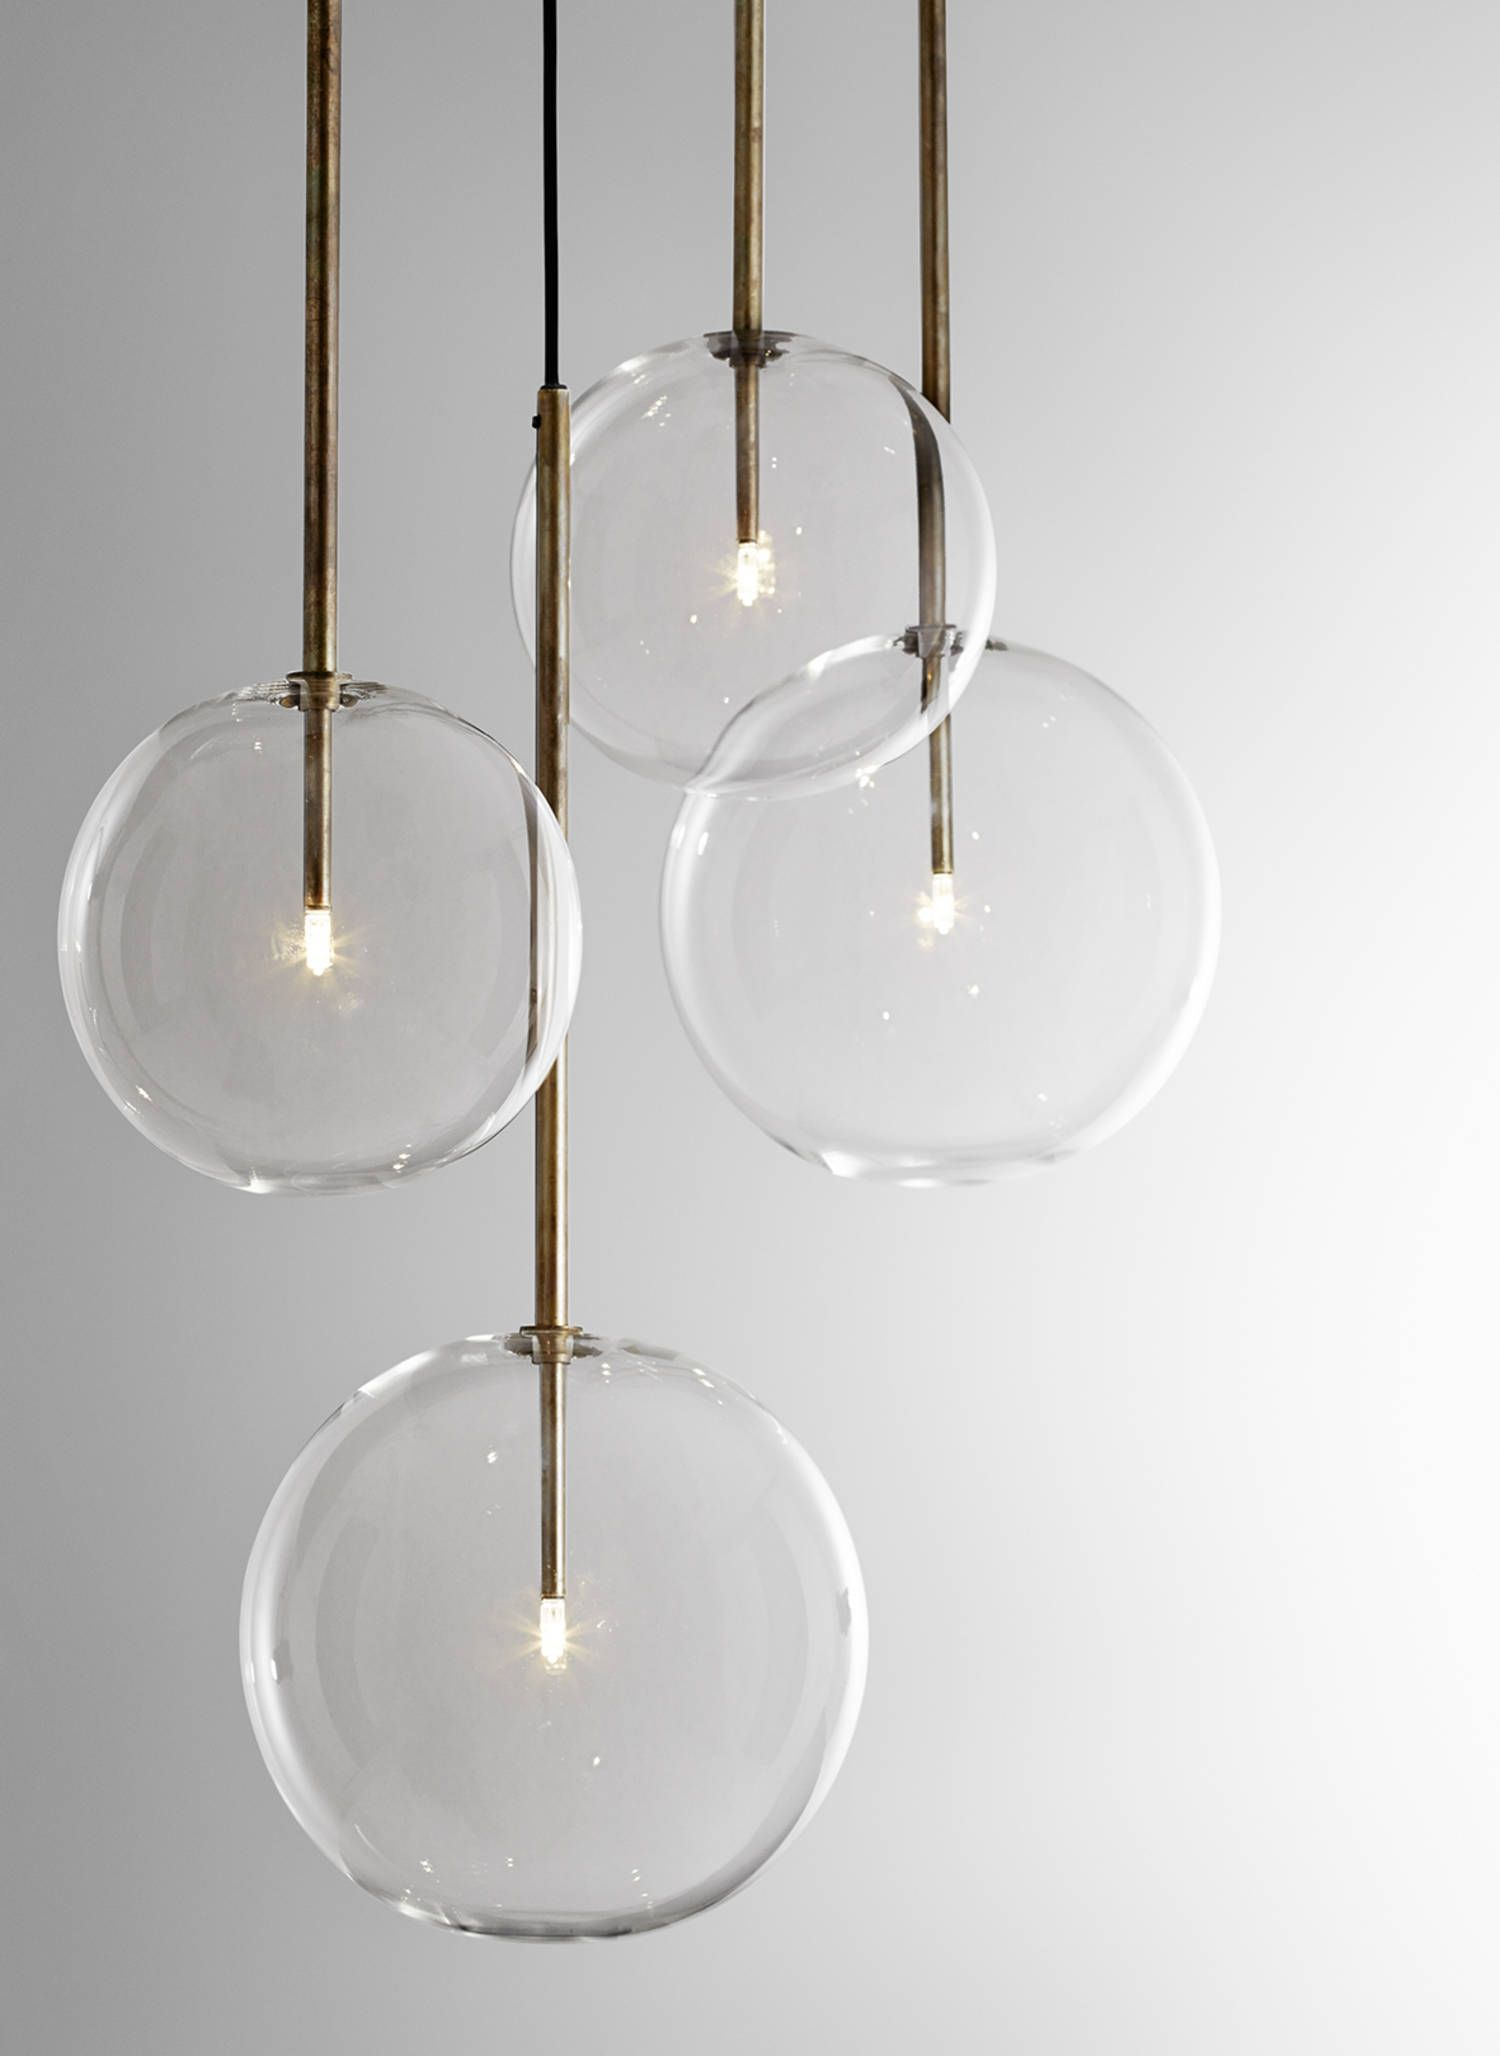 design classic lighting. Bolle Sola | Lighting . Beleuchtung Luminaires Design: Massimo Castagna Gallotti \u0026 Design Classic S